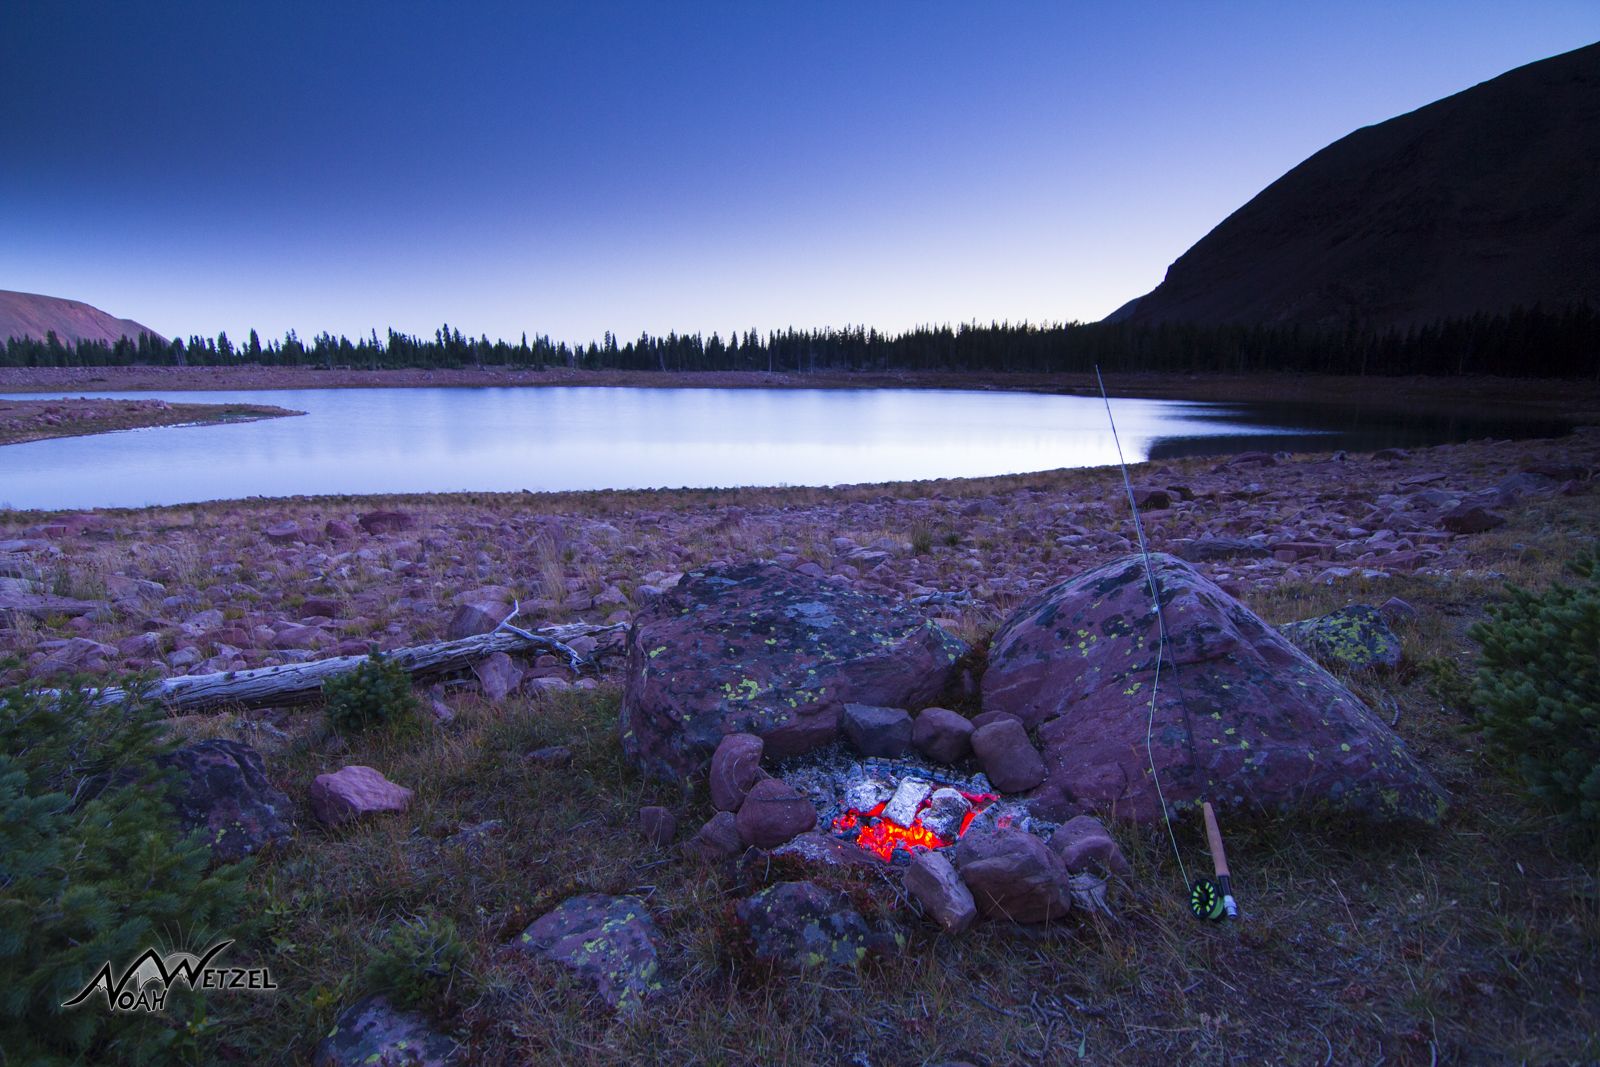 Cooking freshly caught fish at East Timothy Lake. High Uintas Wilderness. Utah